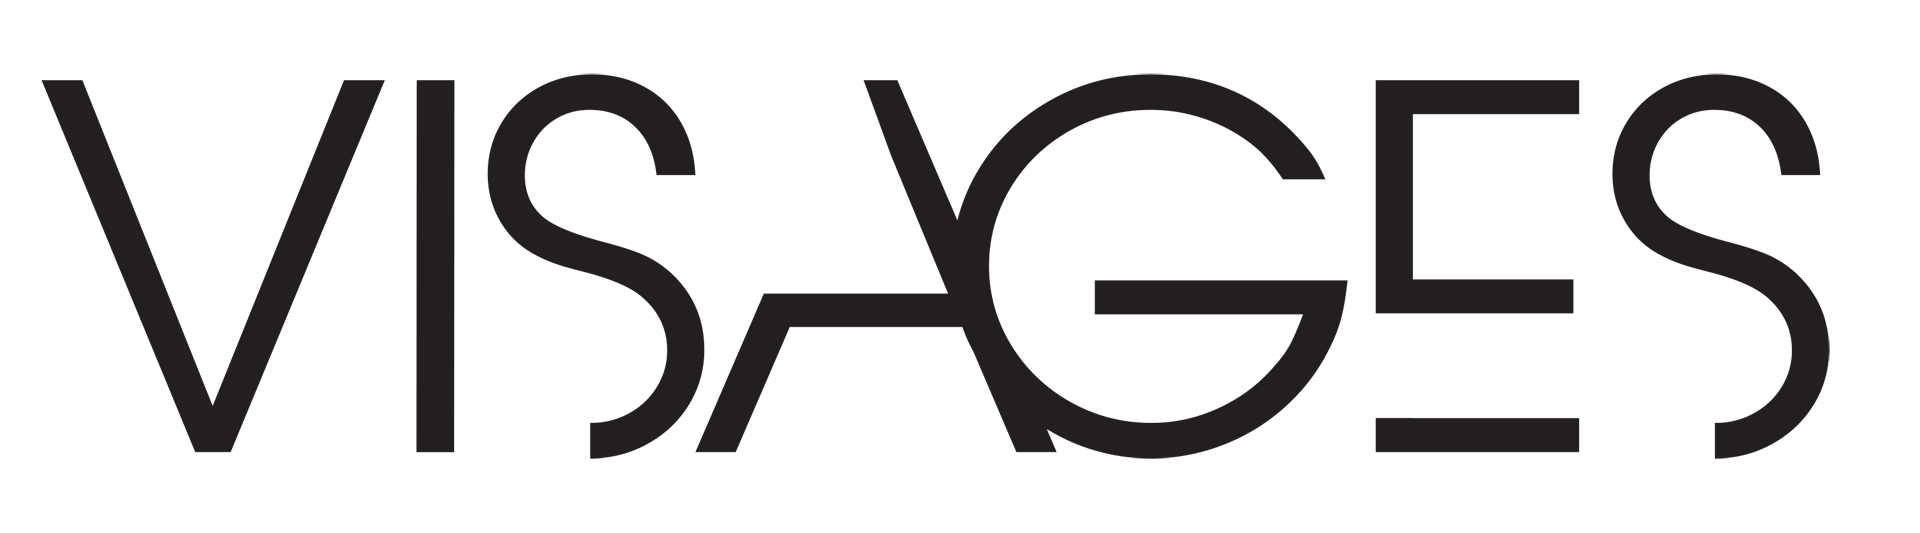 School Visages Models – Школа за модели Визаж